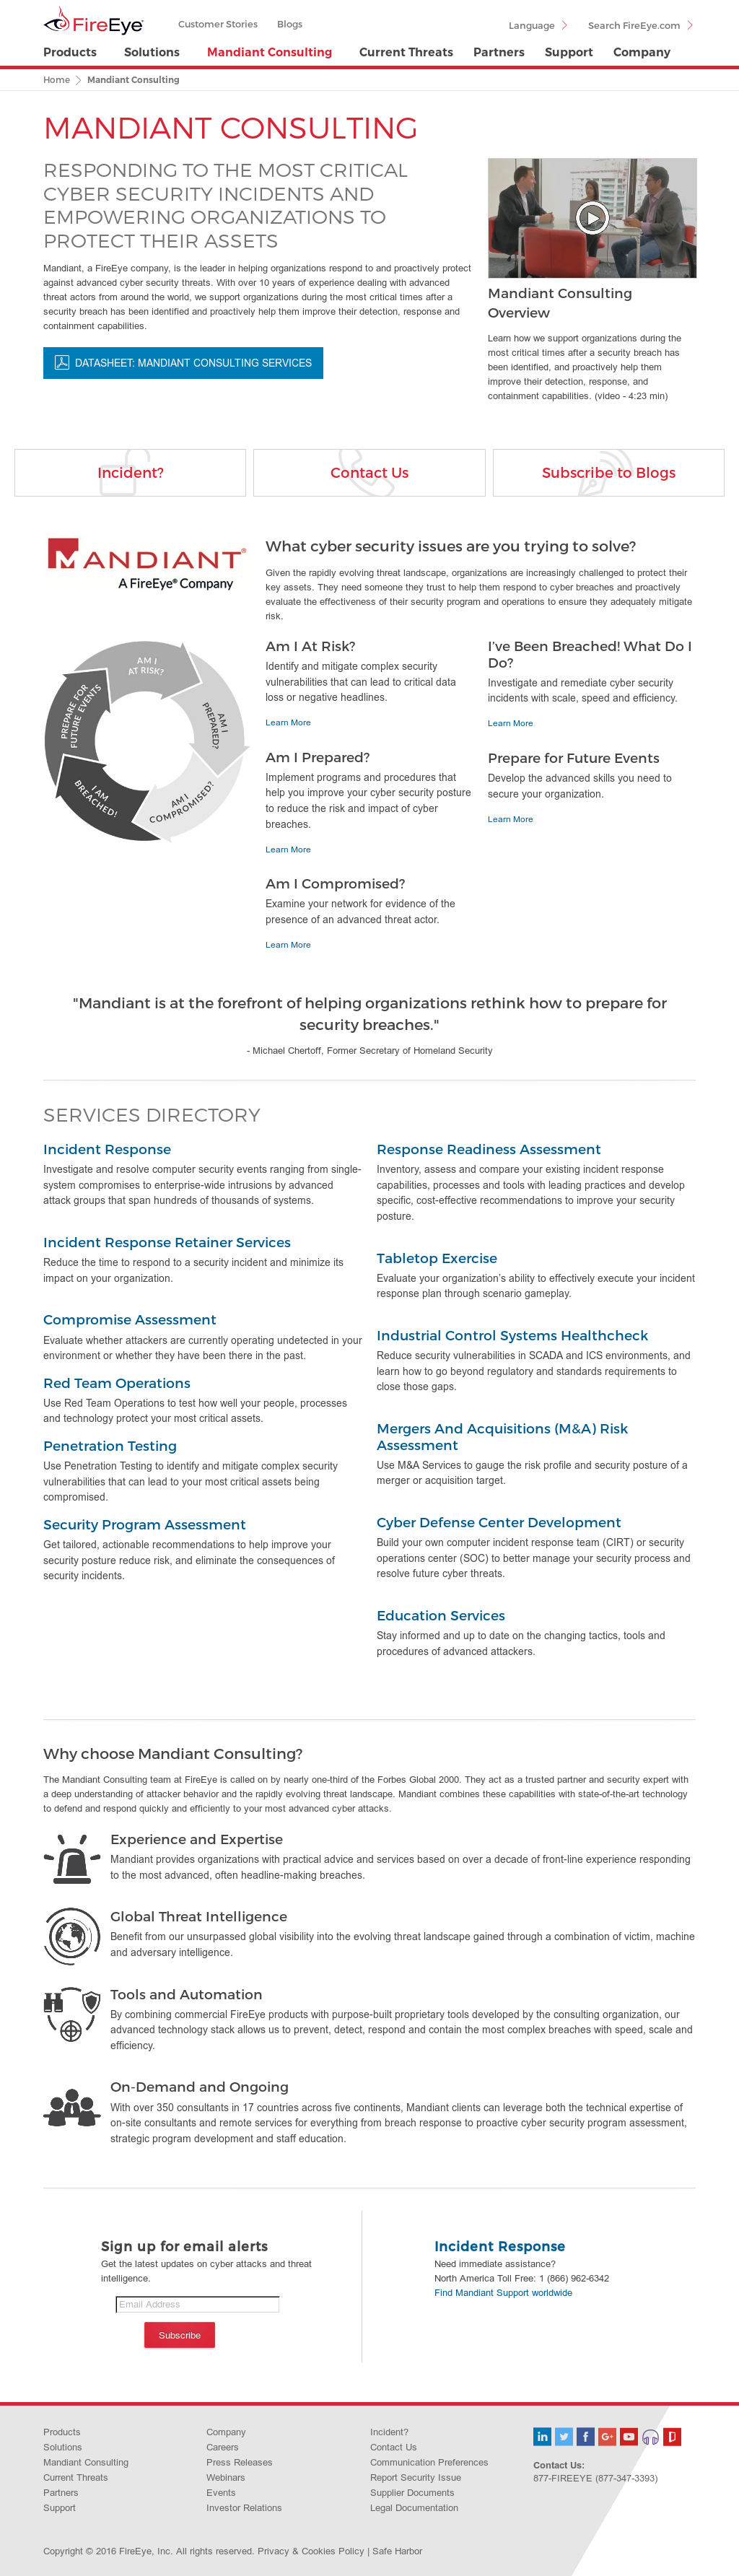 Mandiant, A Fireeye Company Competitors, Revenue and